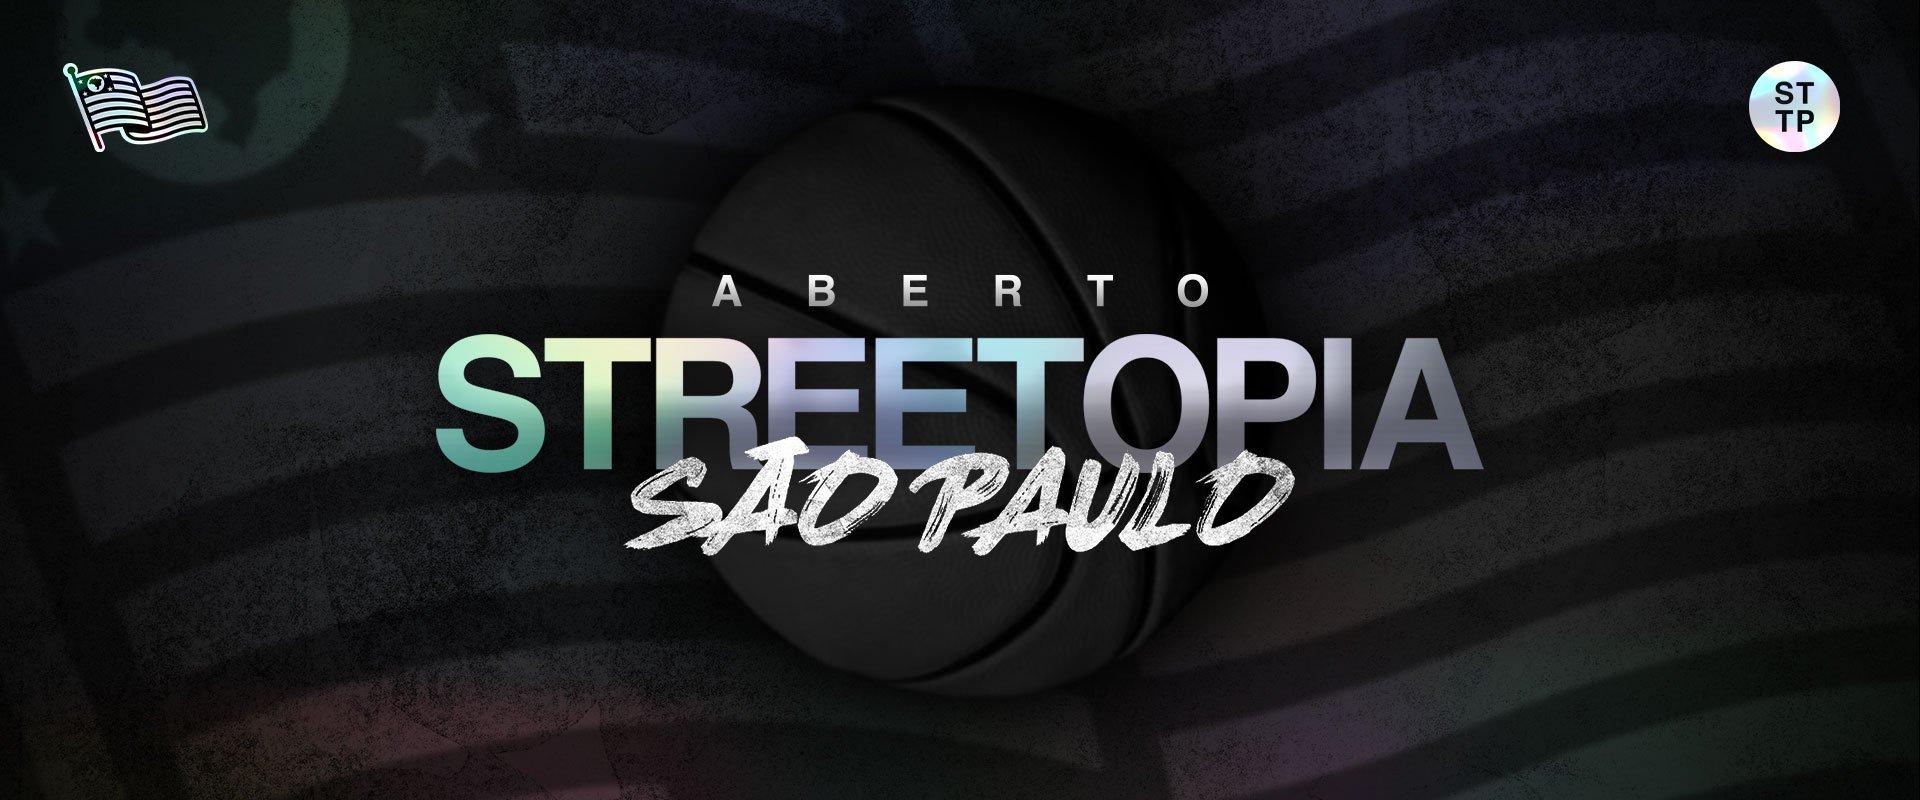 ABERTO STREETOPIA MOVIMENTA CENA DO BASQUETE PAULISTANO